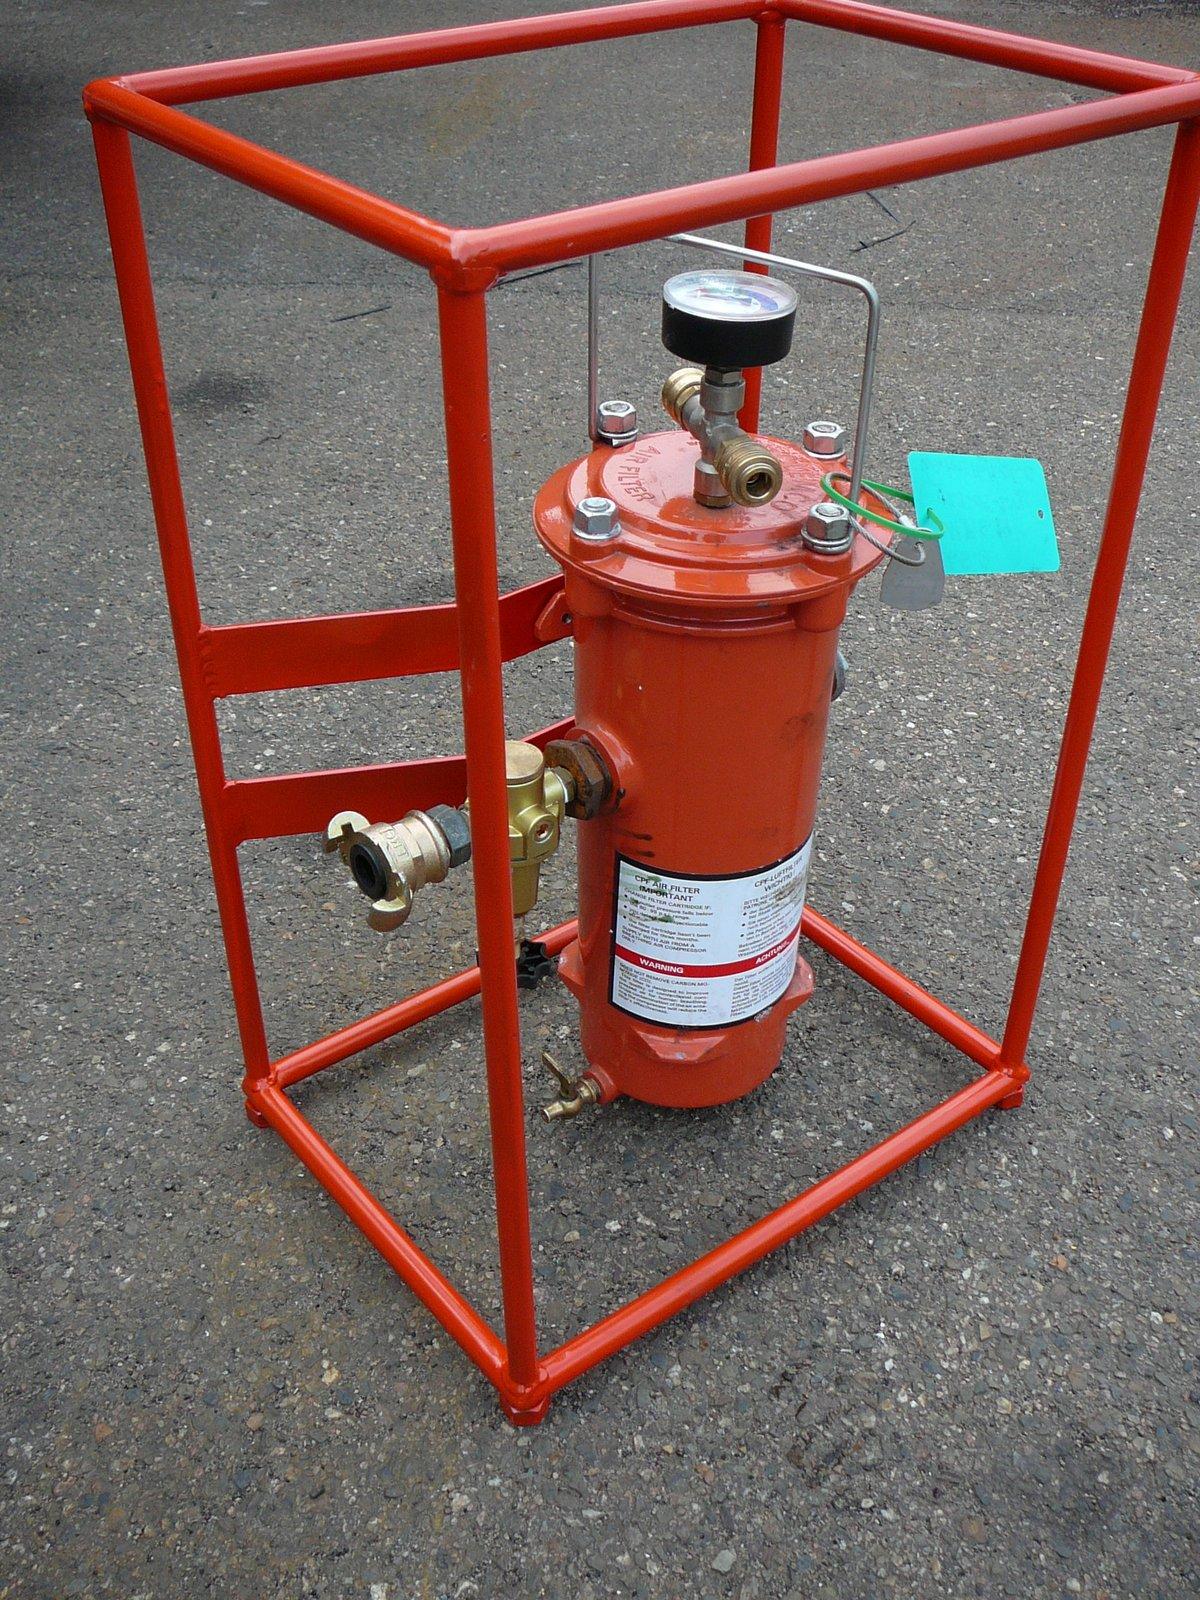 Luchtbehandelingsapparatuur Image